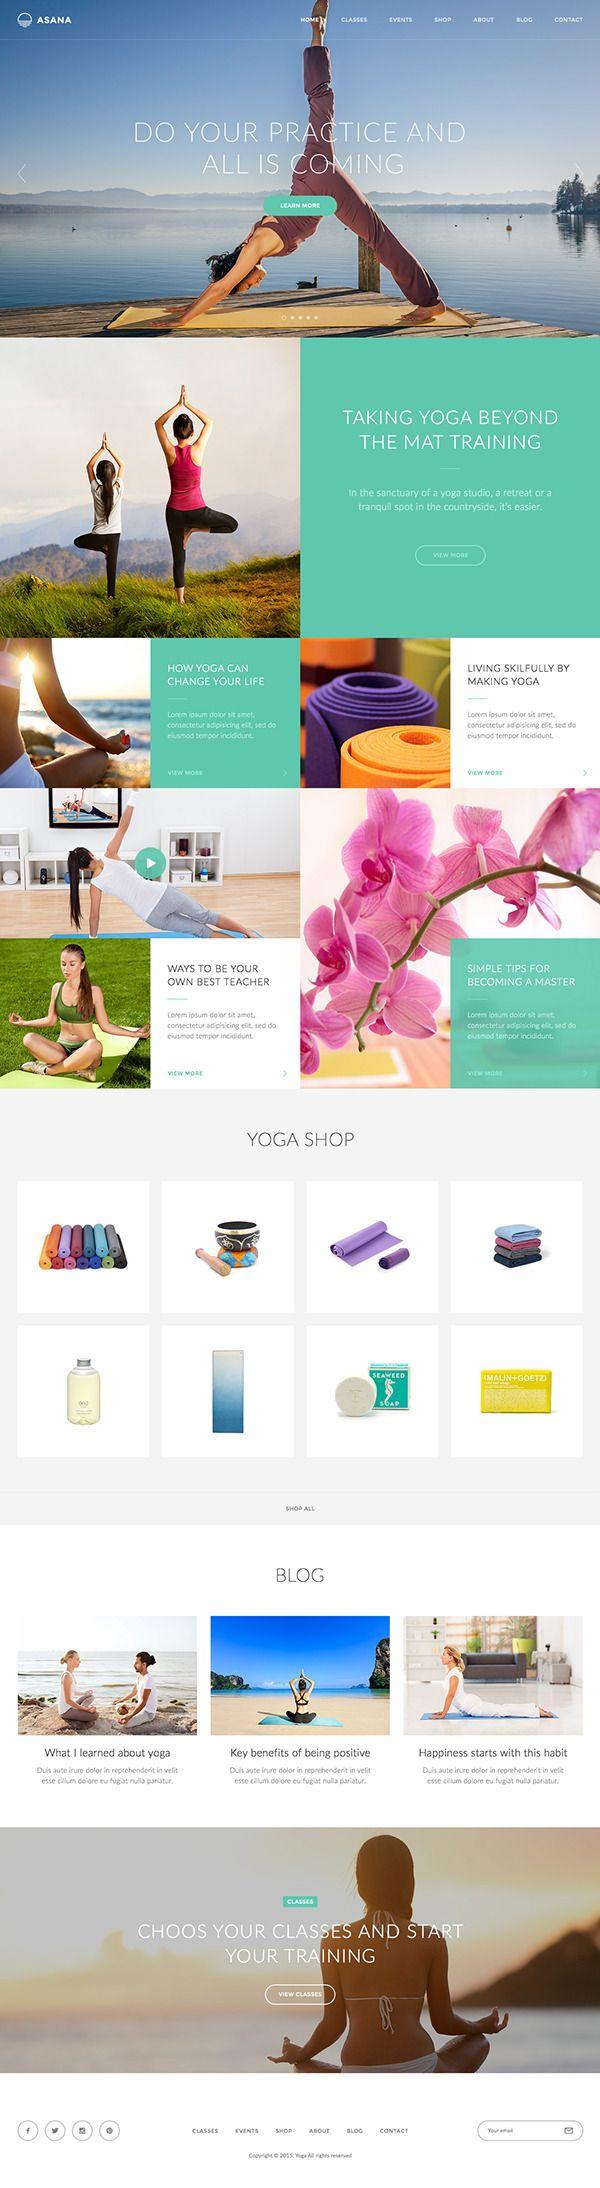 Asana - Sport and Yoga Template on Behance